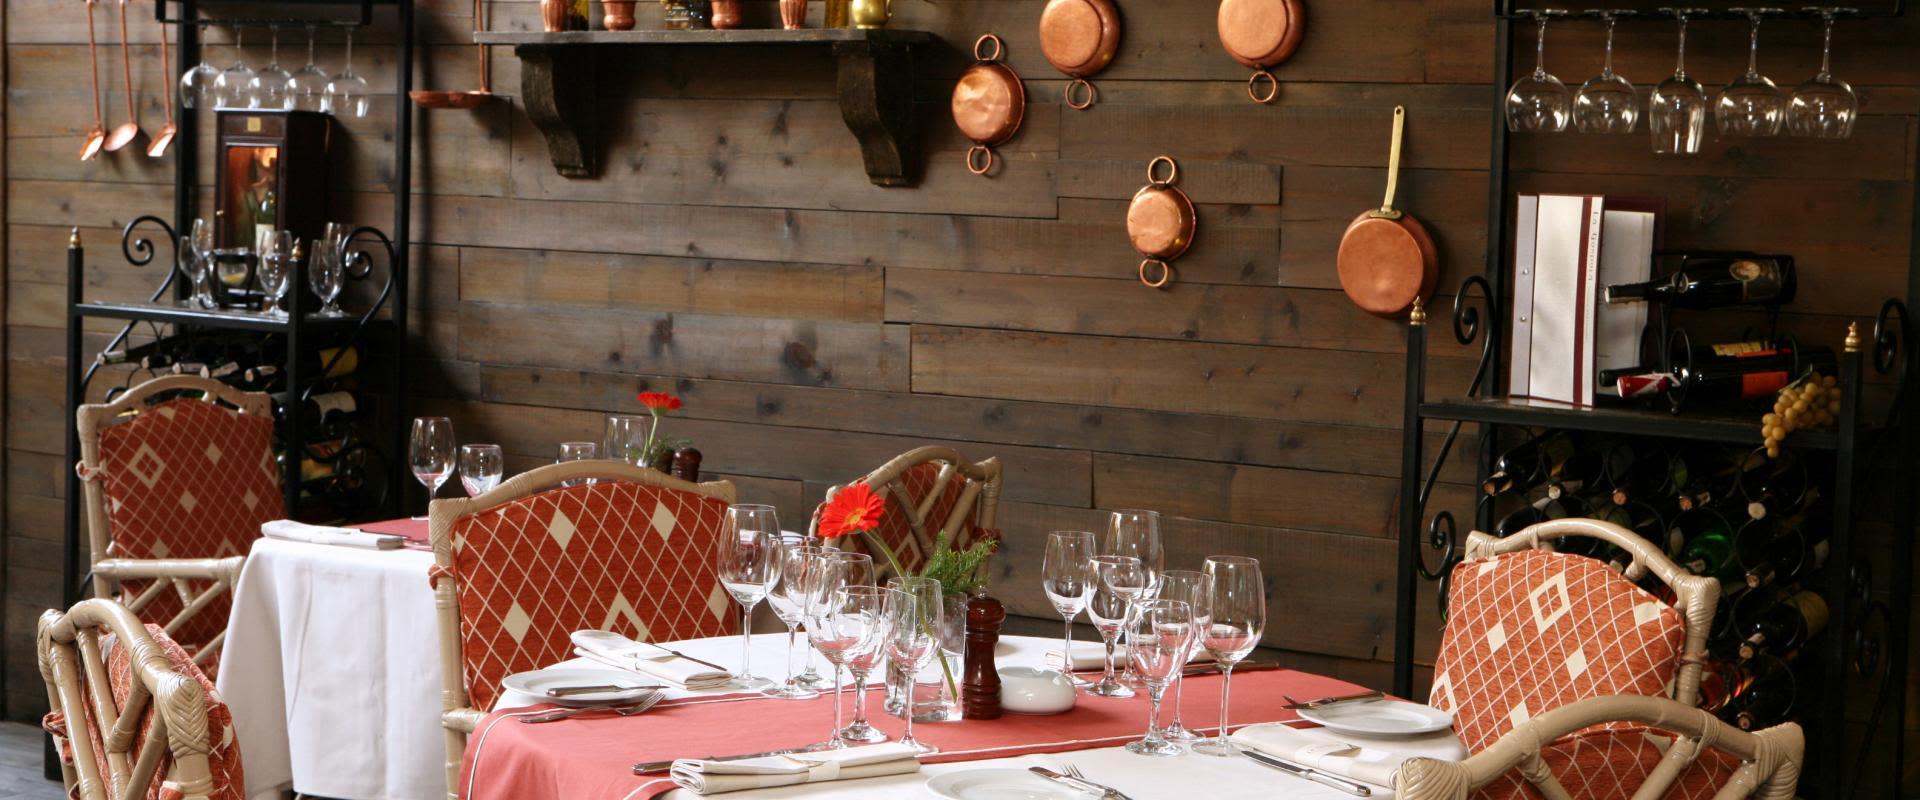 La Gondola - Italian Restaurant